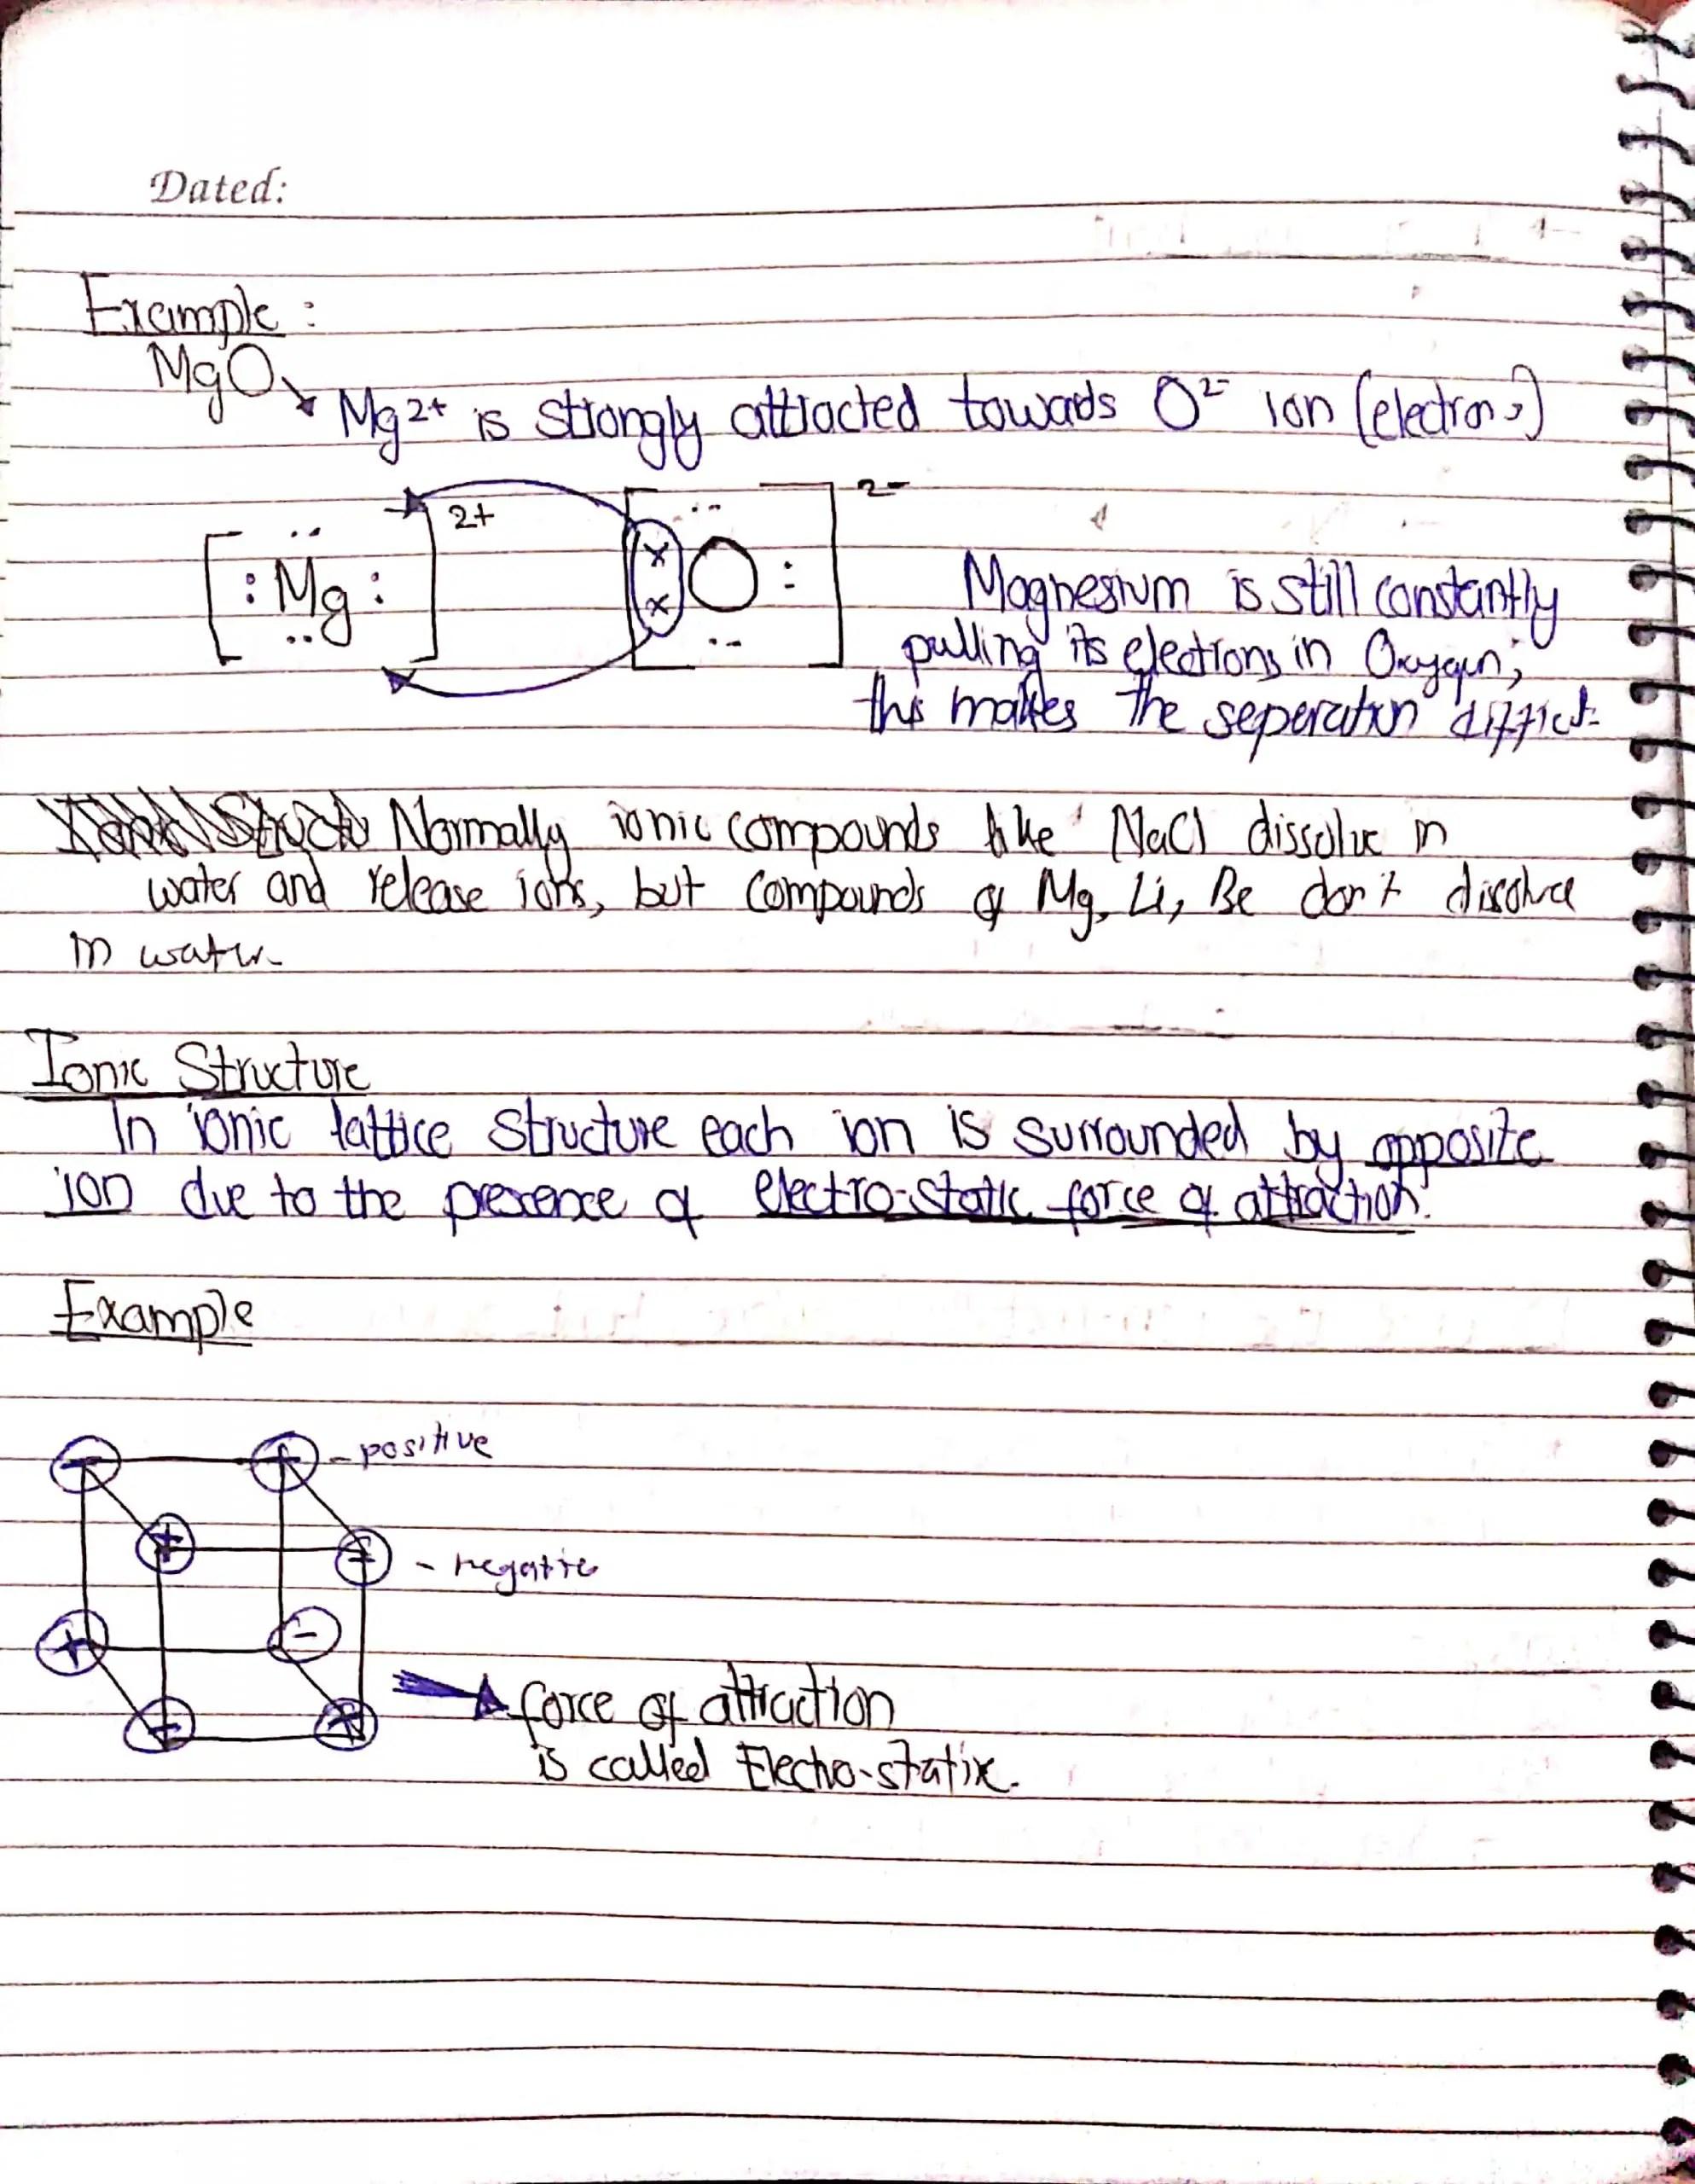 chemical bonding Sir Kashif_5